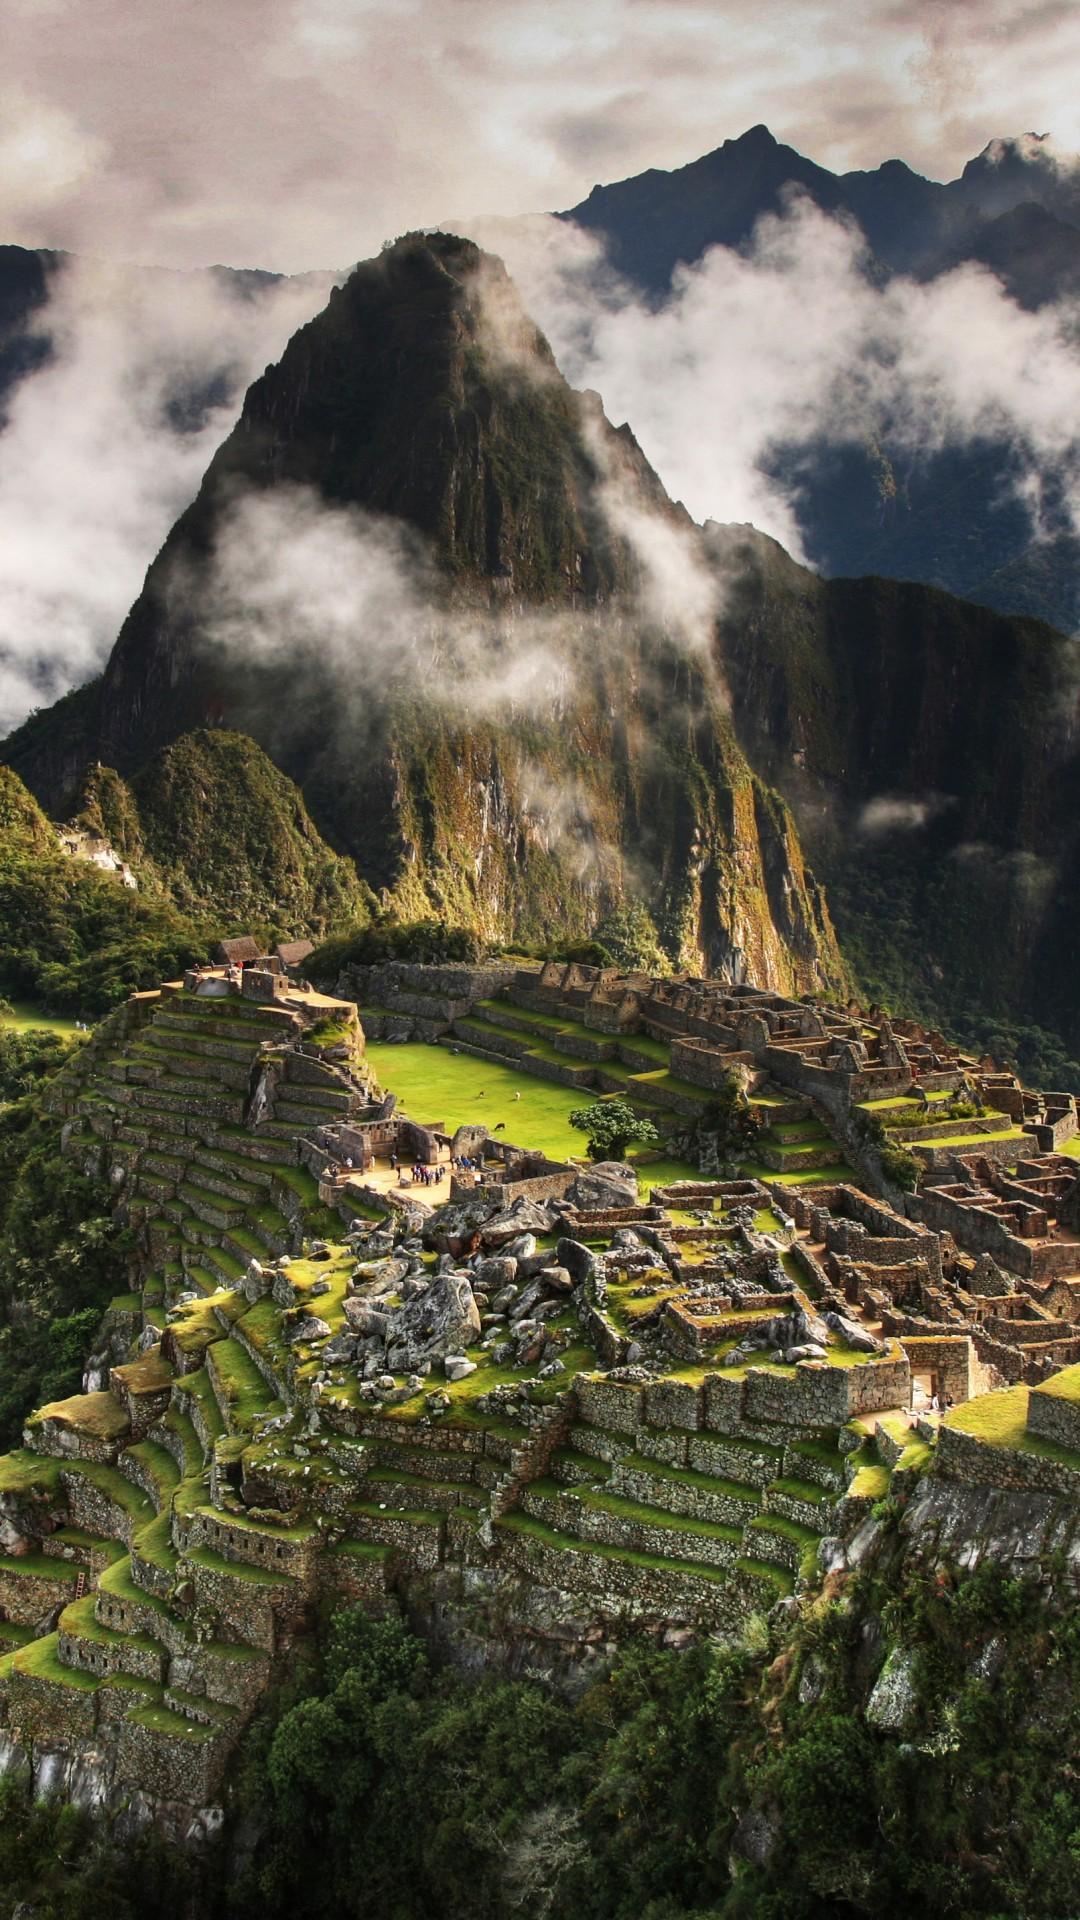 Download Wallpapers Of Beautiful Girls Wallpaper Machu Picchu 5k 4k Wallpaper Peru Mountains